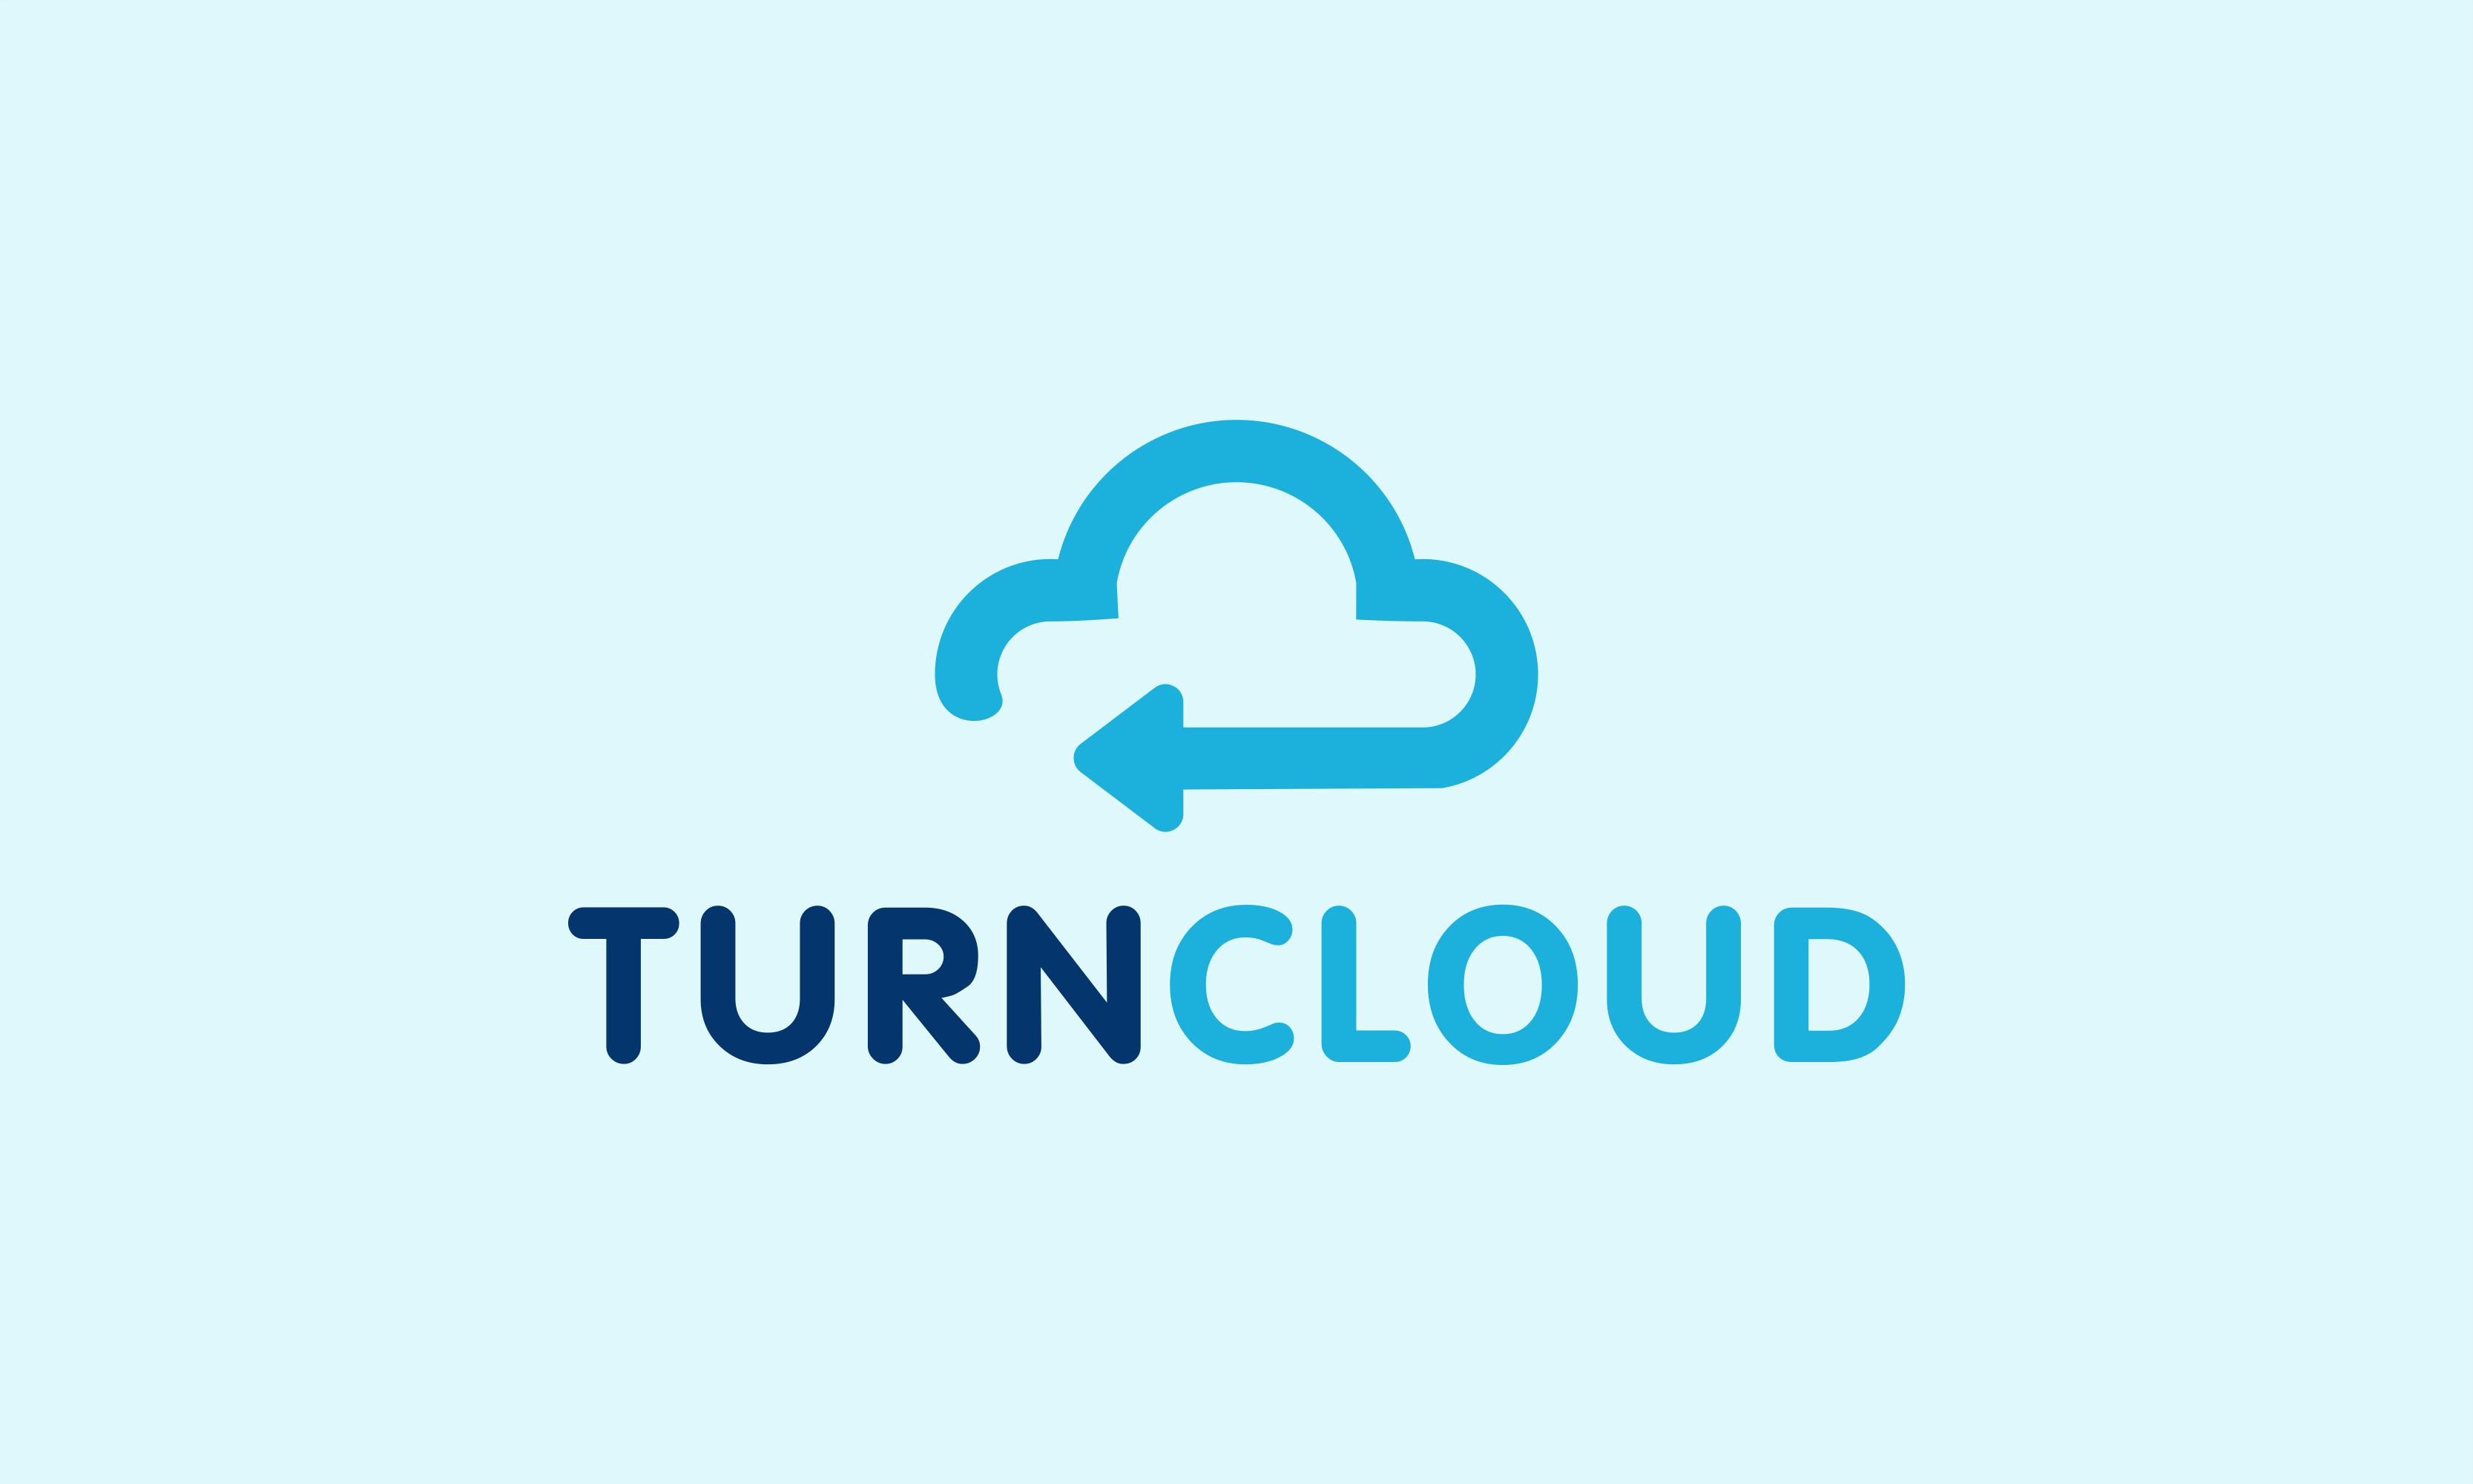 Turncloud